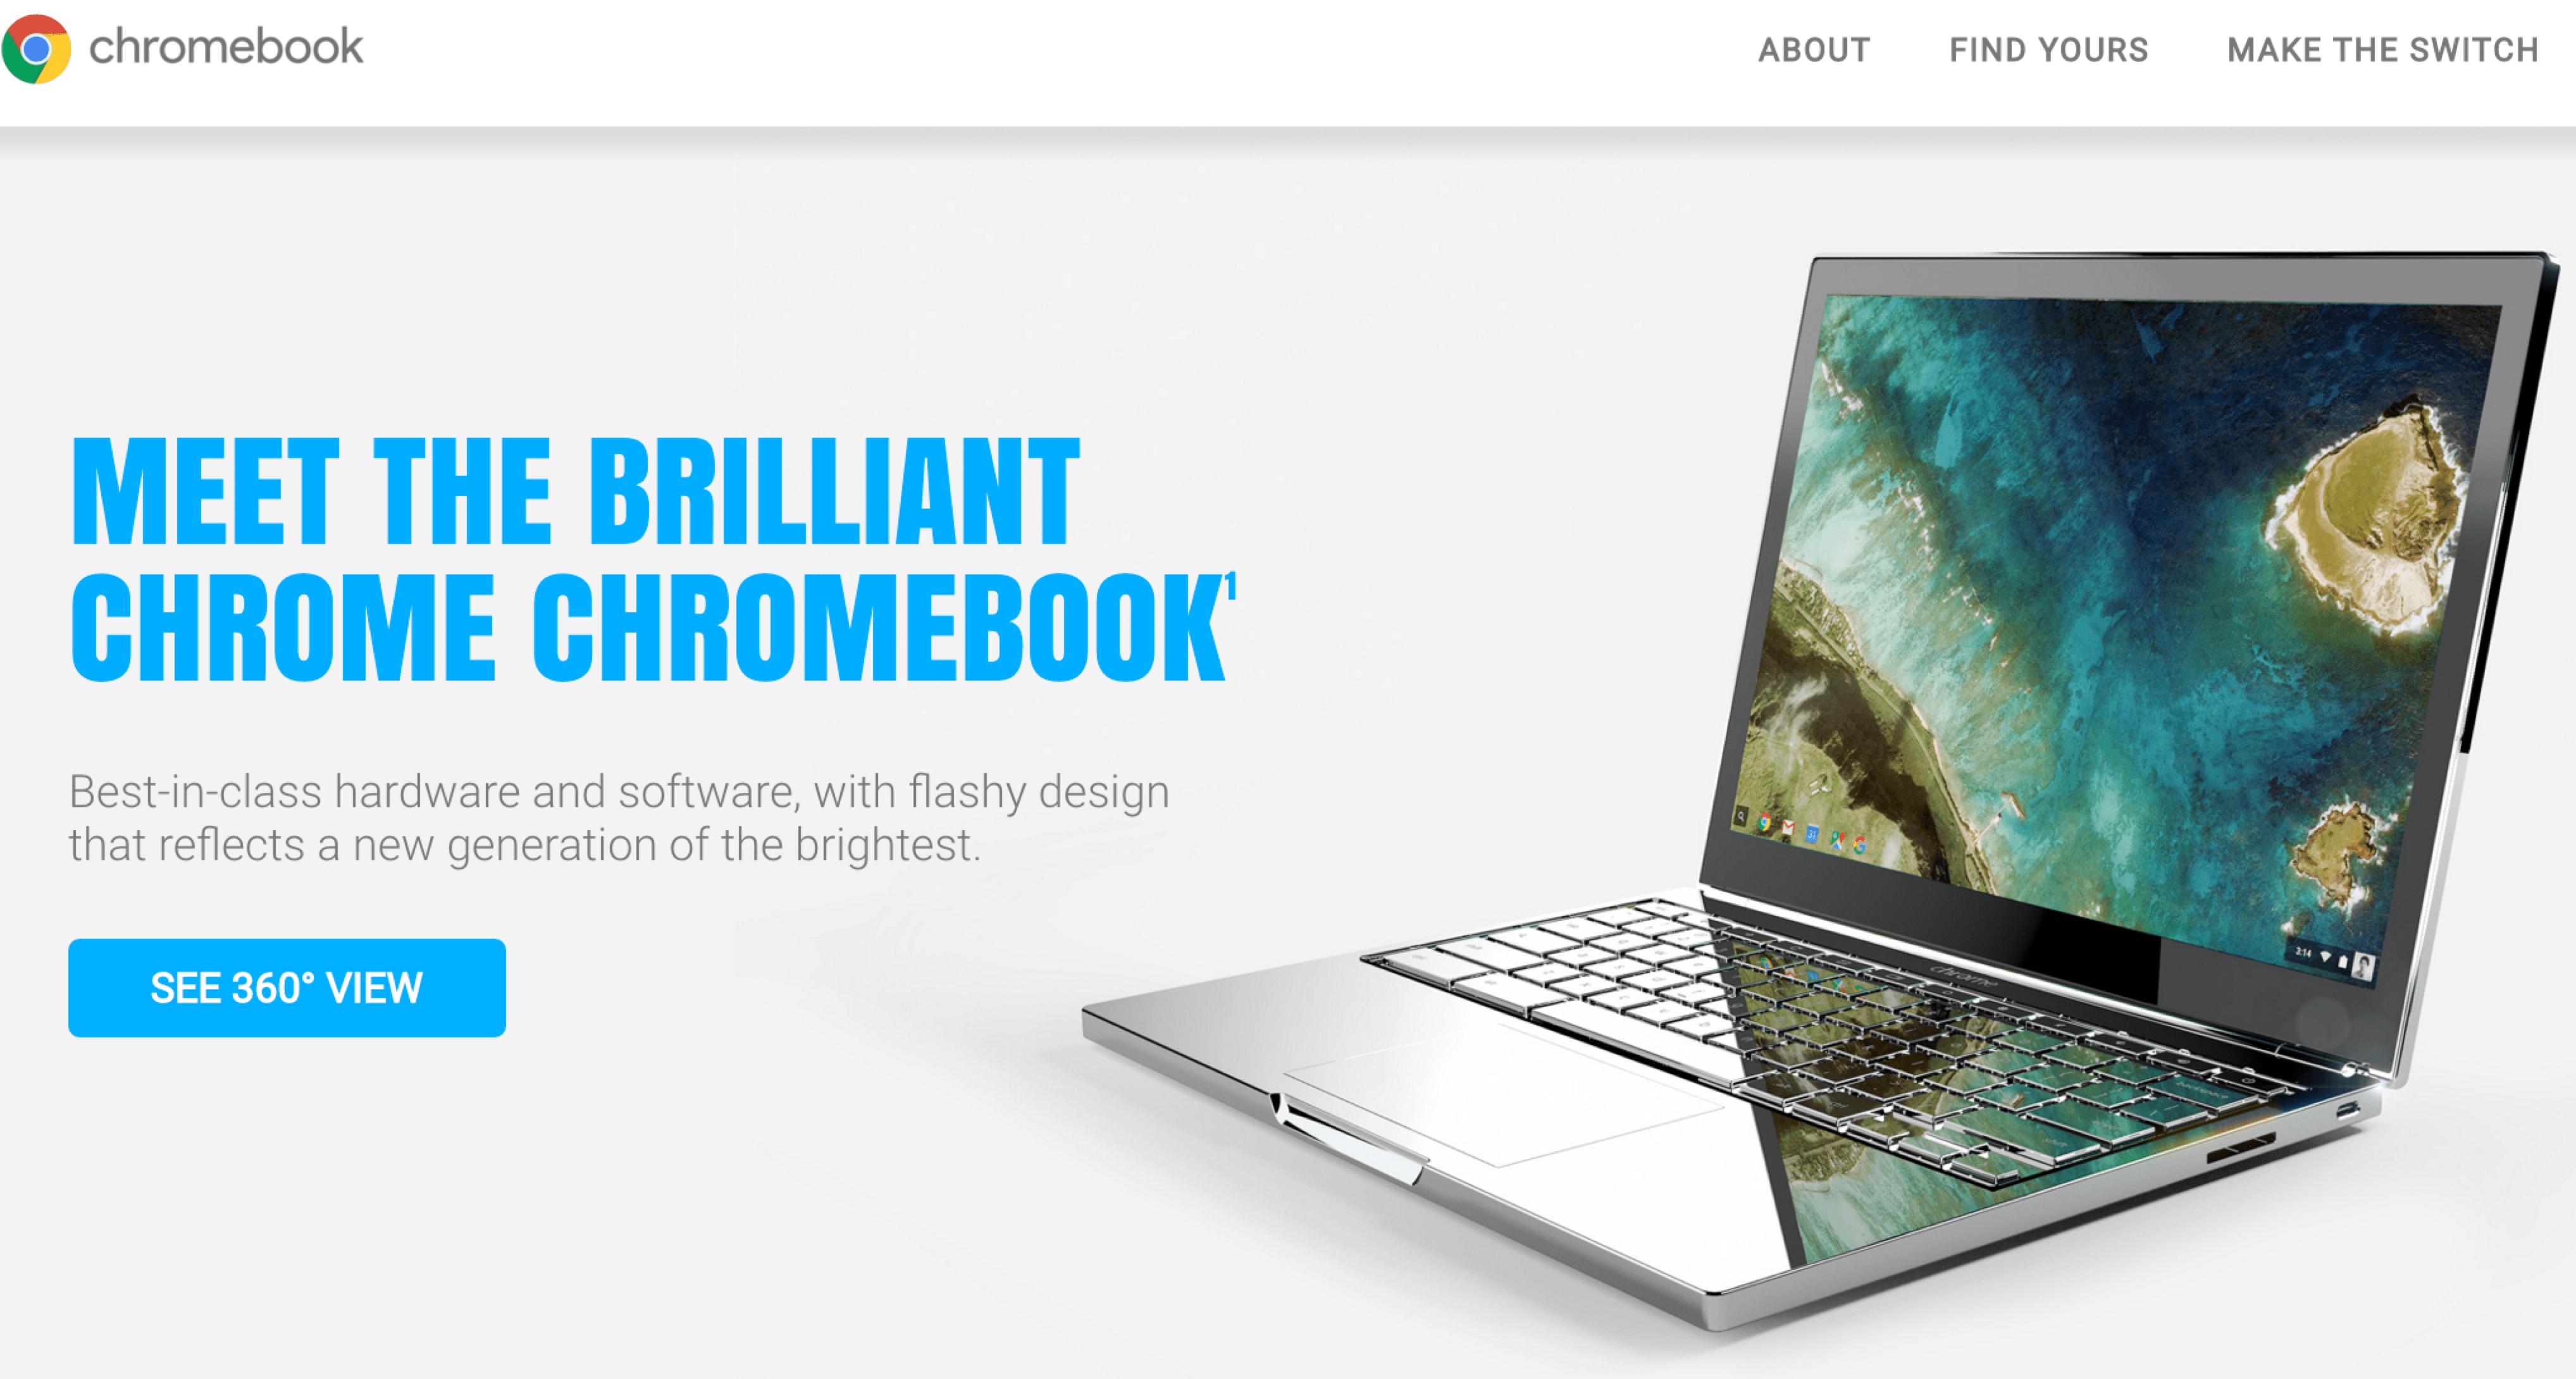 Chrome Chromebook